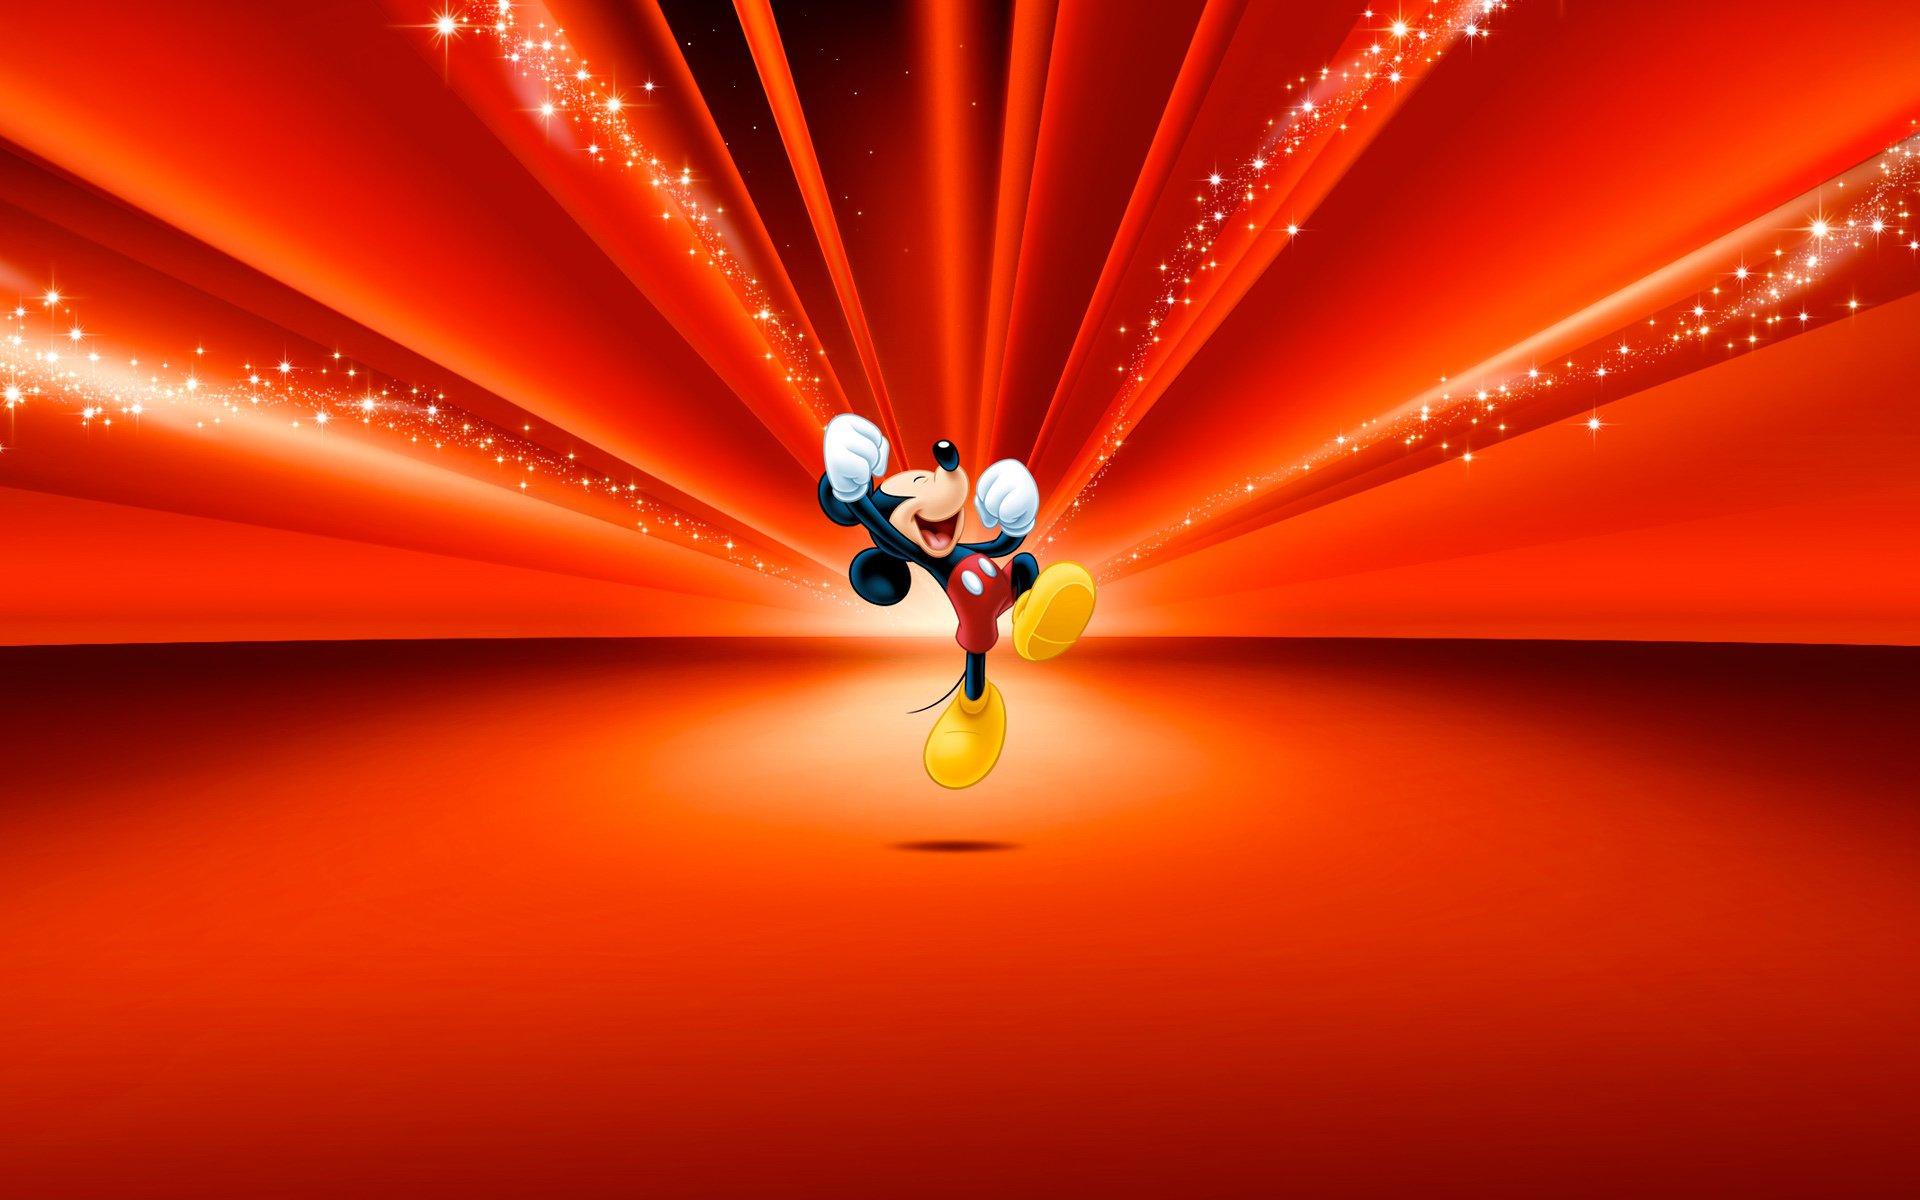 Mickey Mouse Wallpaper Desktop Background Disney cartoon character 1920x1200